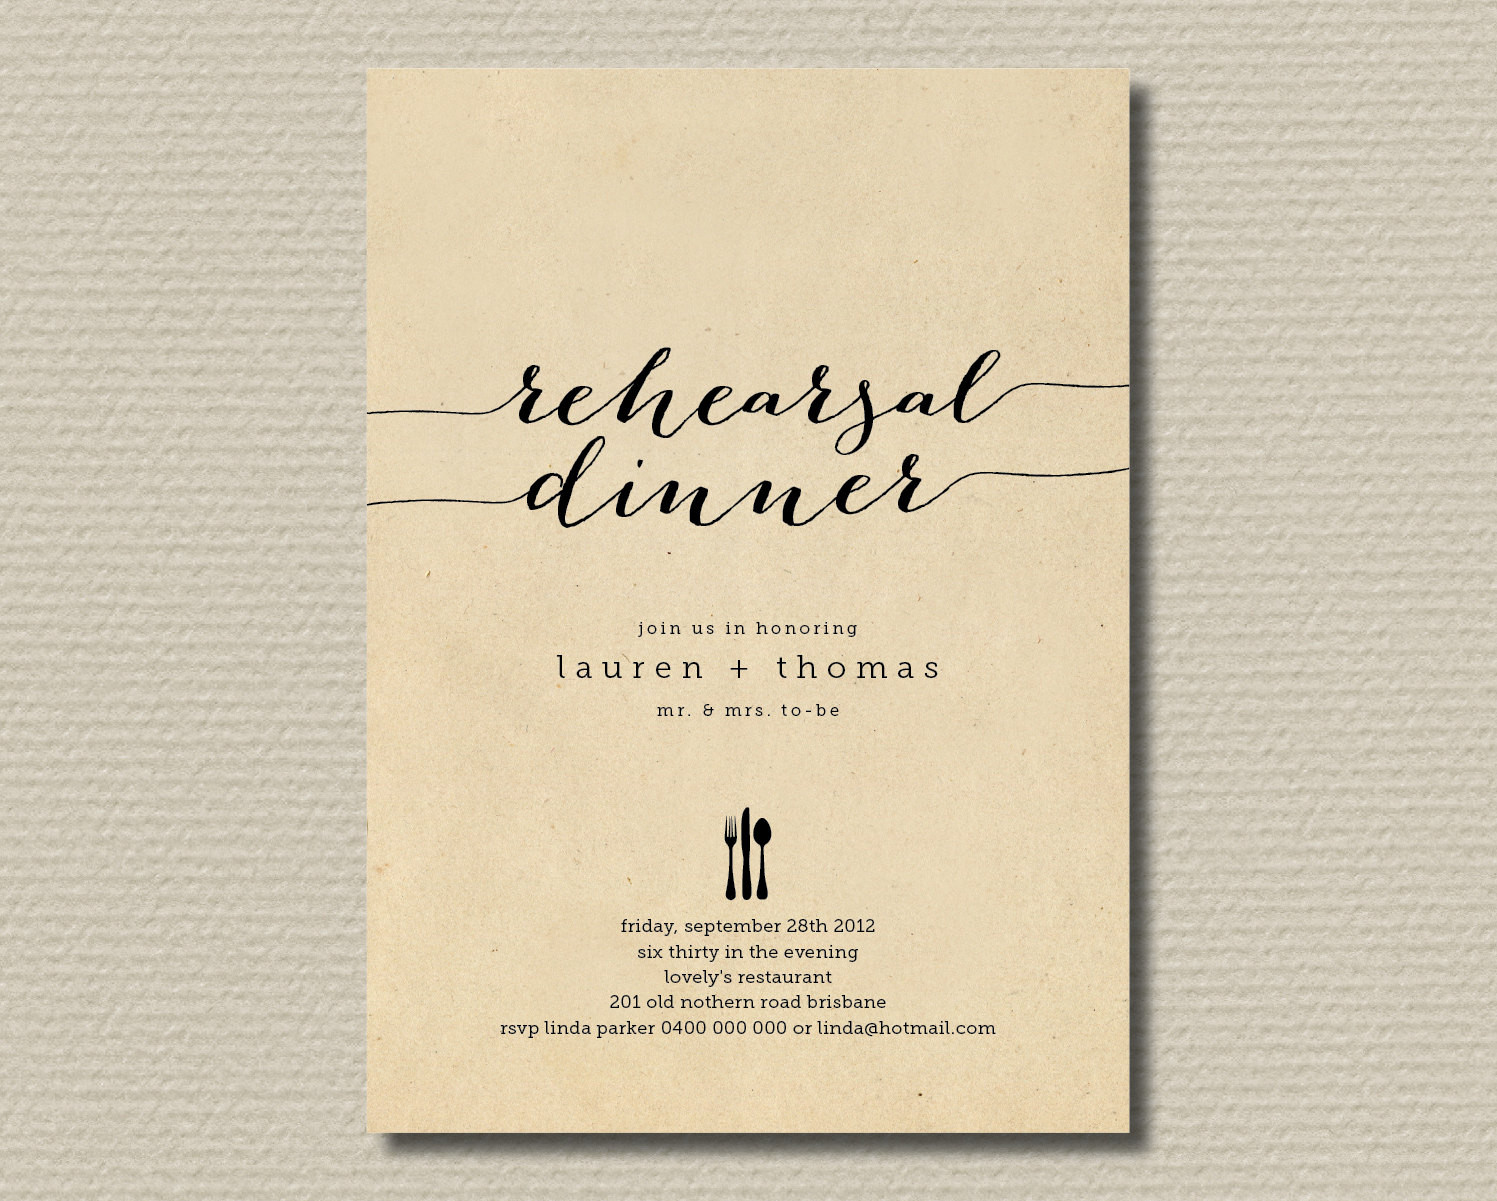 Wedding Rehearsal Dinner Invitations  Printable Wedding Rehearsal Dinner Invitation by